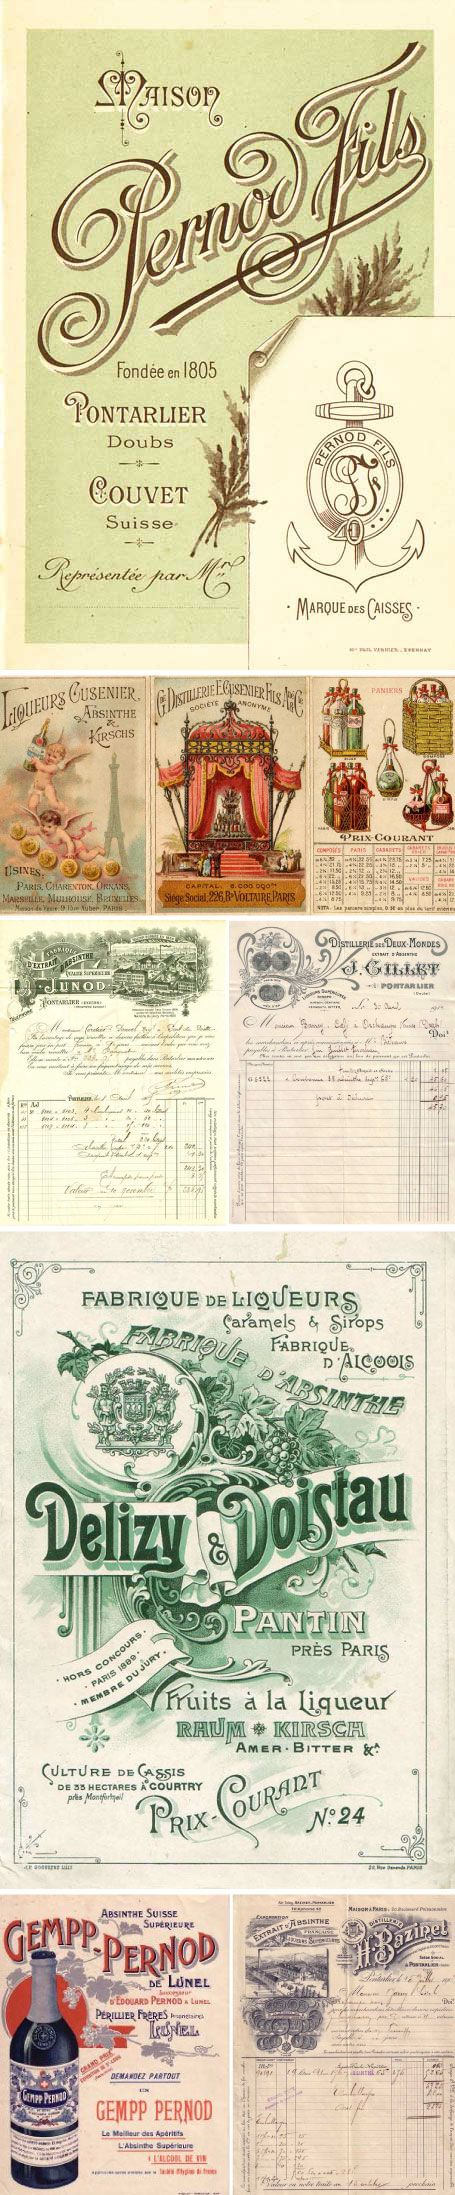 Absinthe labels